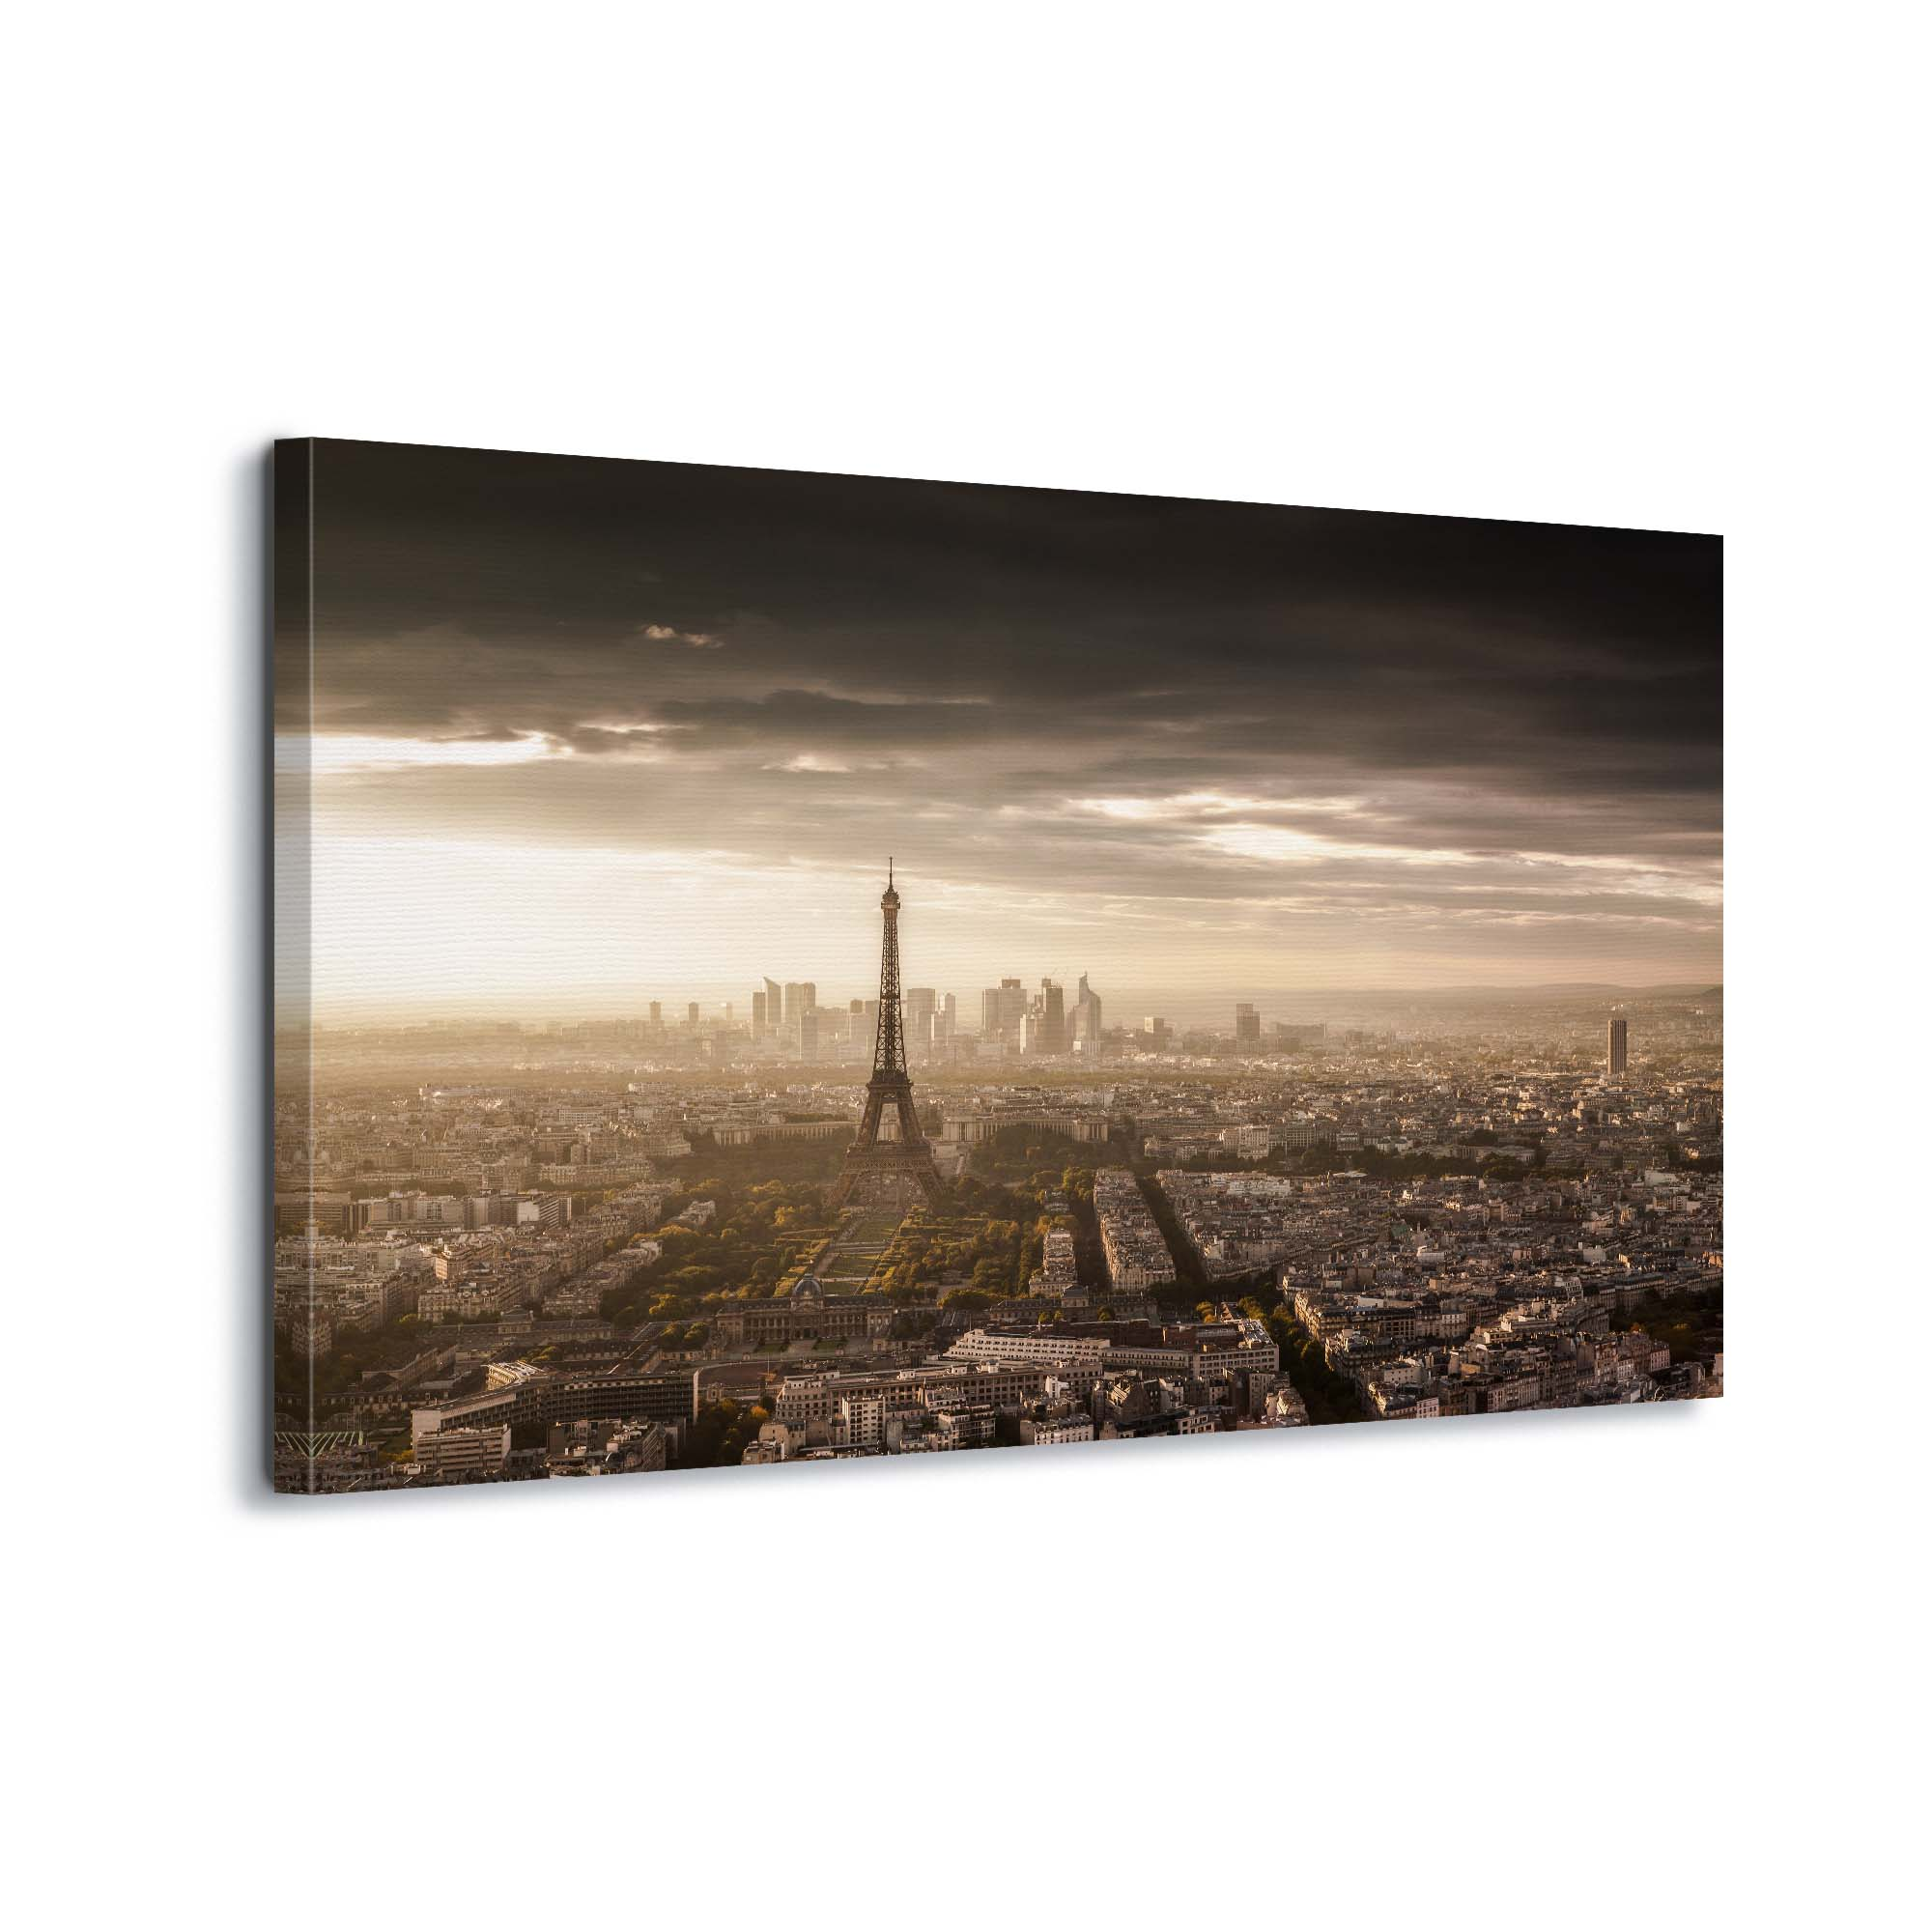 Paris Manificence by Jaco Marx